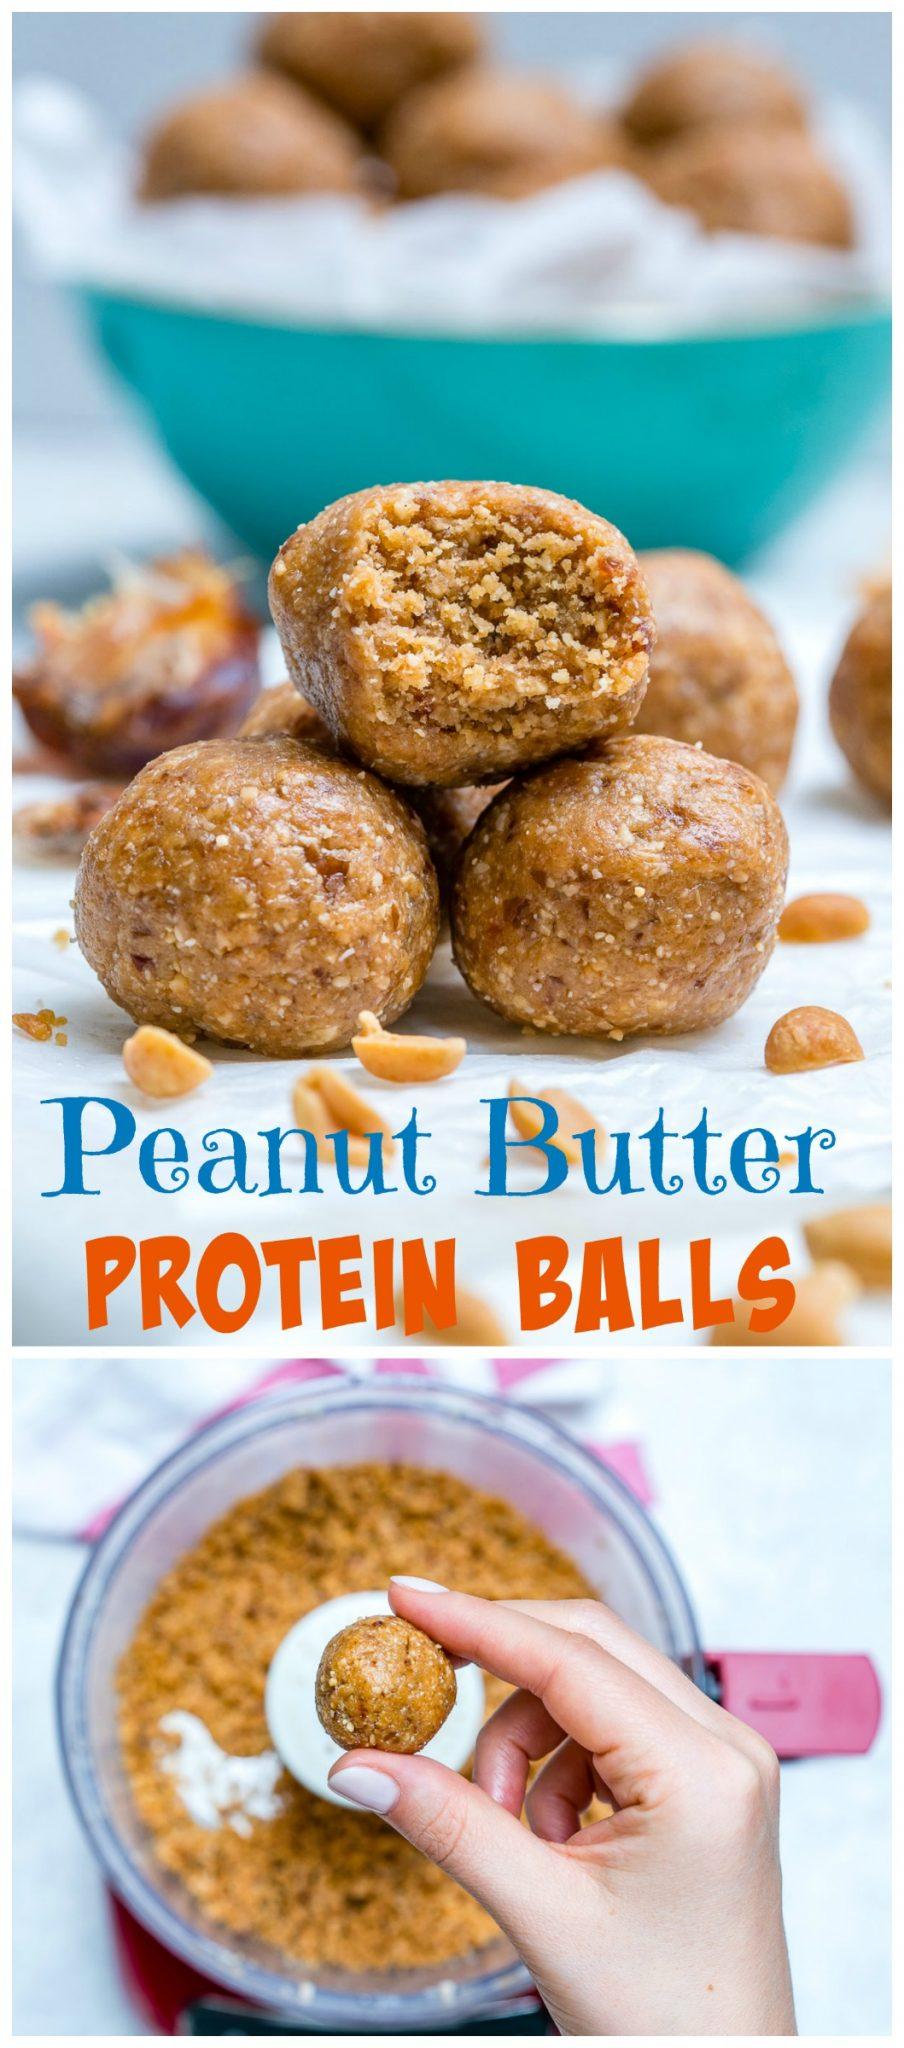 CleanFoodCrush Peanut Butter Protein Balls